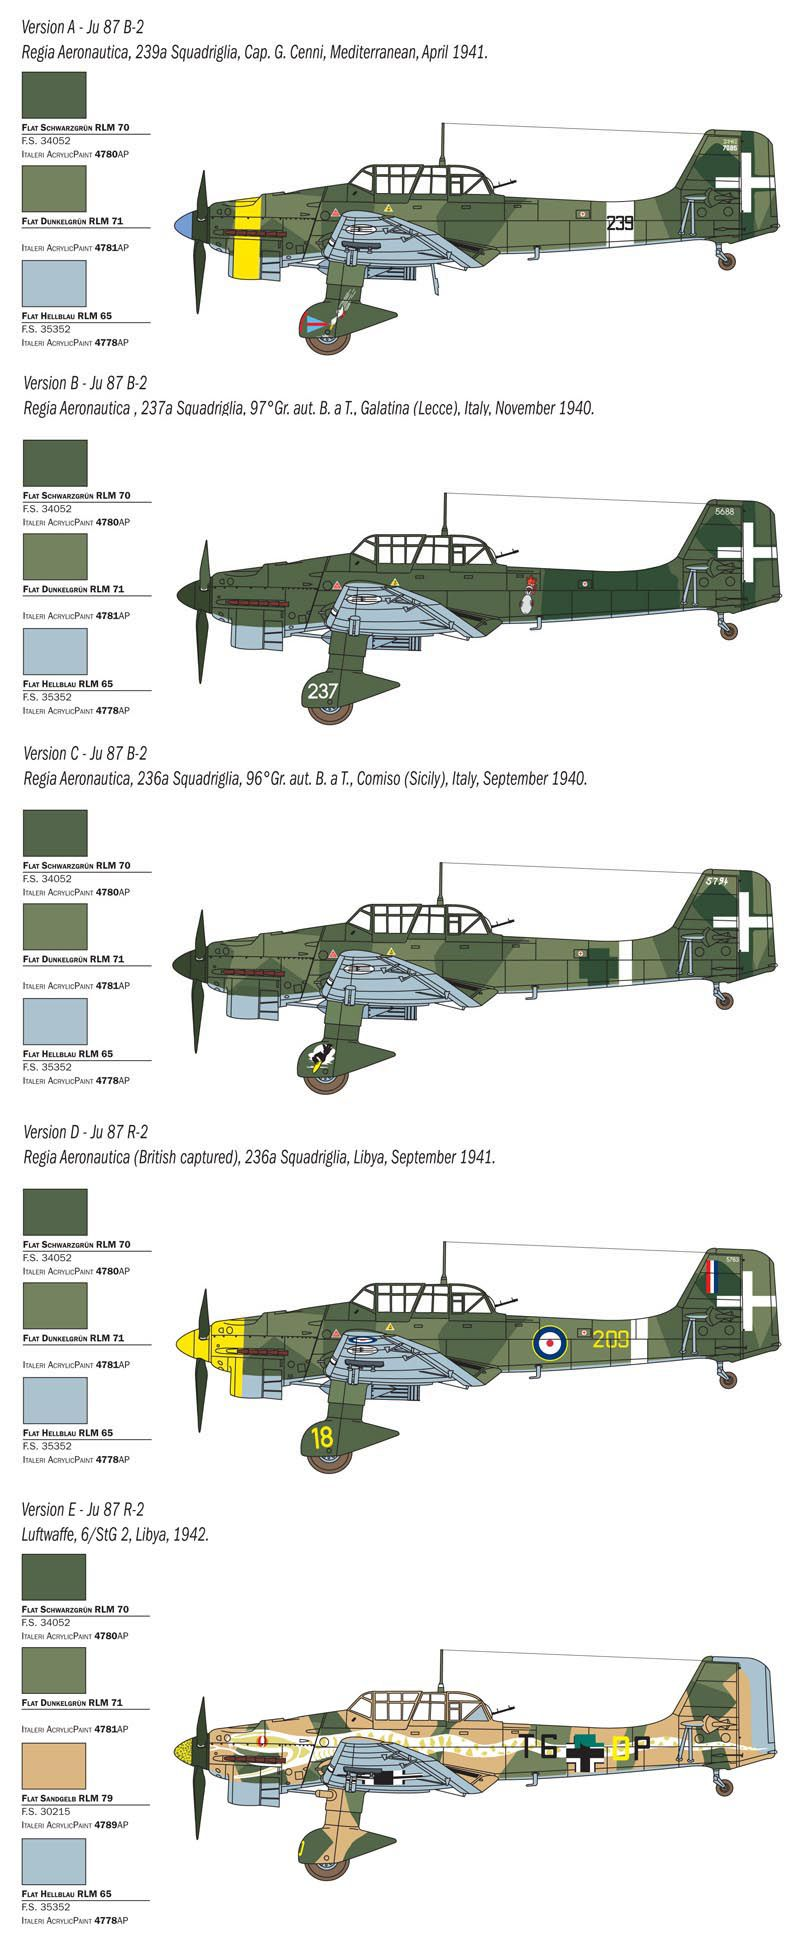 JU 87 B-2/R-2 PICCHIATELLO - 1/48 - Italeri 2769  - BLIMPS COMÉRCIO ELETRÔNICO